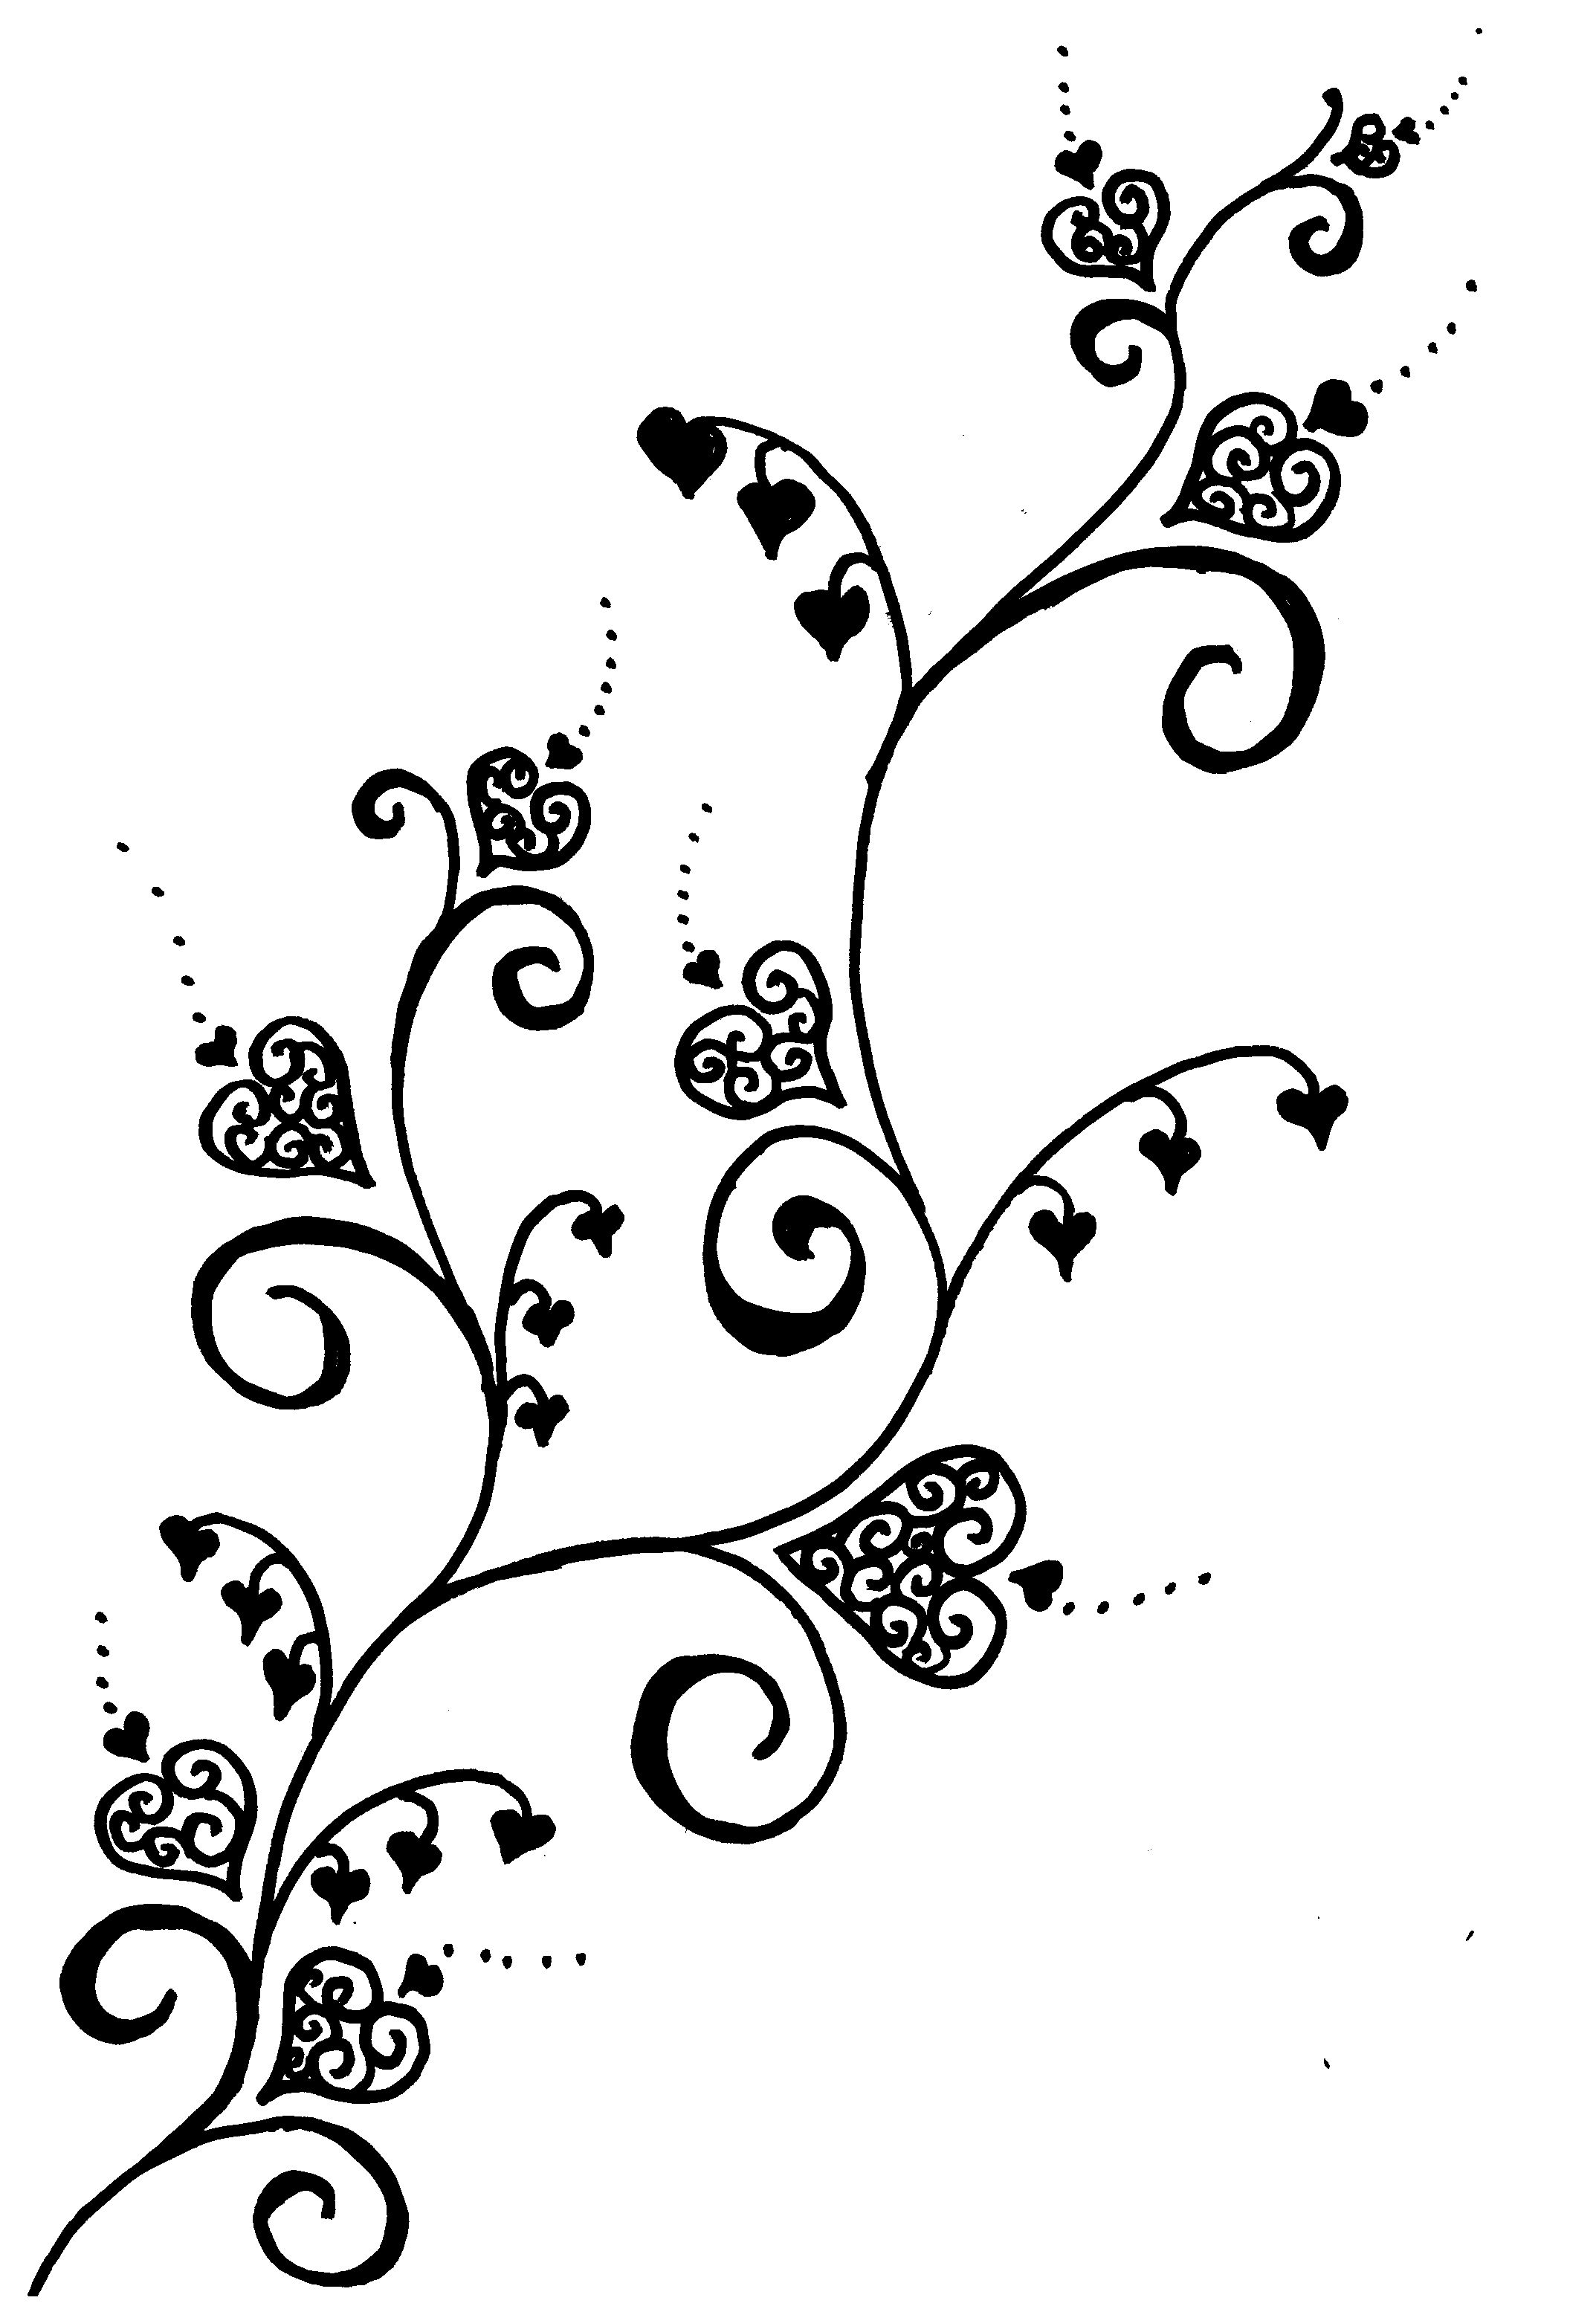 Heart tattoos designs - Rose Vine Tattoo Designs List Of All Vines Tattoos Design Images